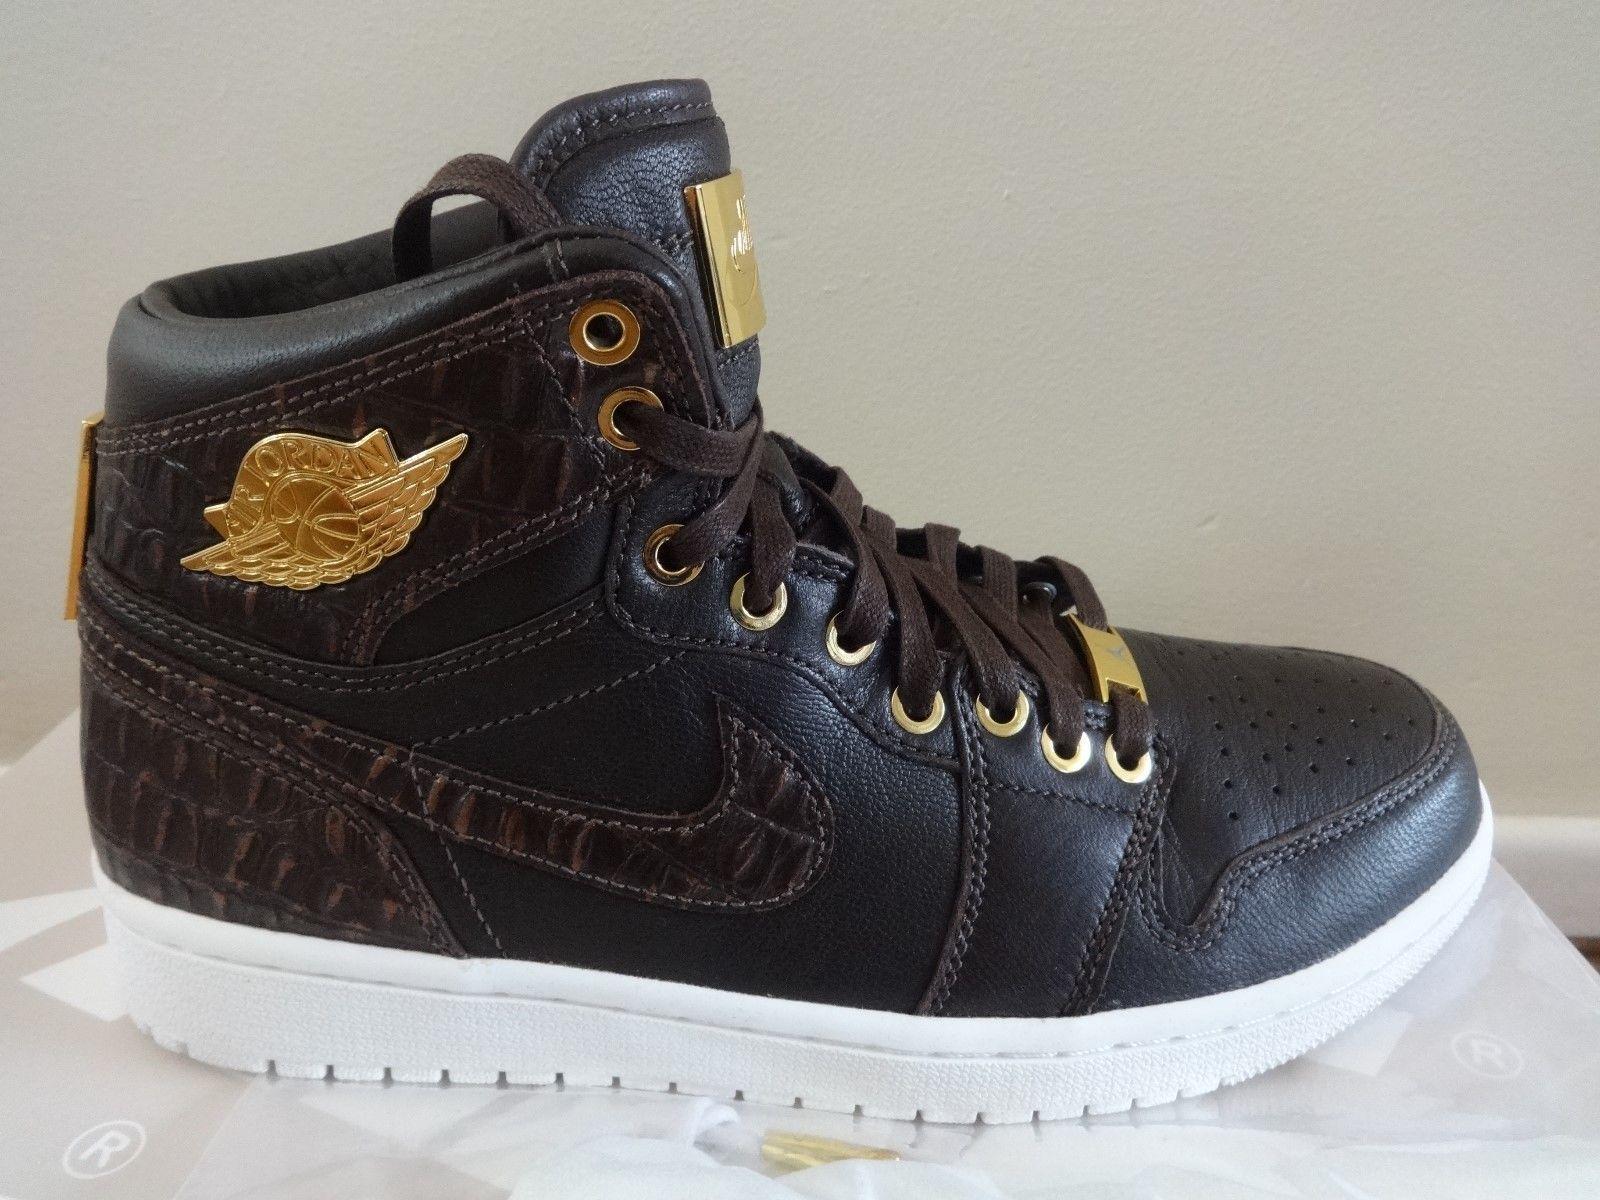 Nike sneakers Air Jordan 1 Pinnacle Hombre Trainers sneakers Nike Zapatos 705075 205 NEW+BOX 76a8df